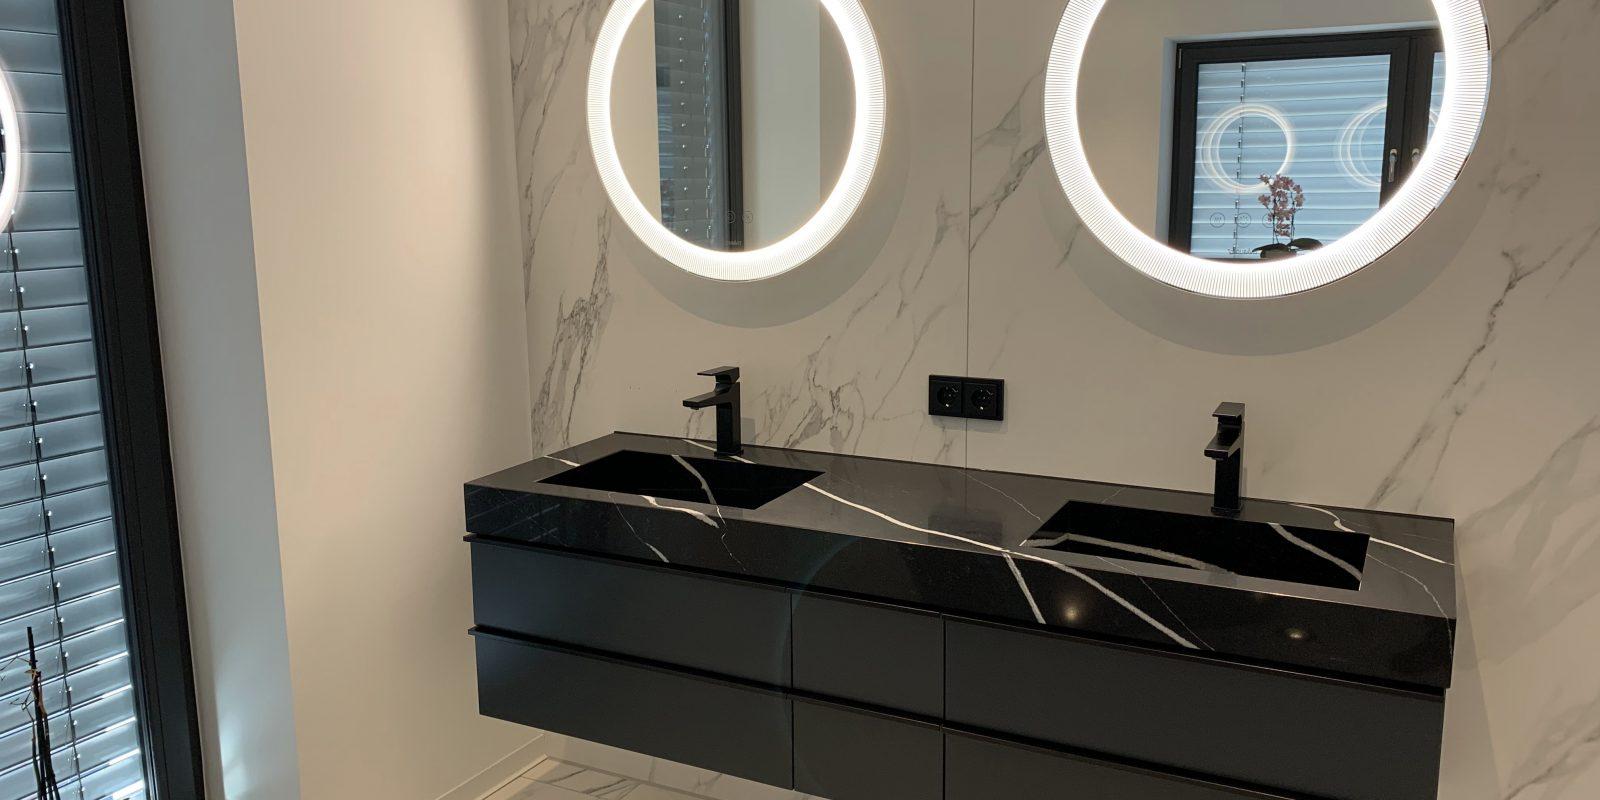 Hochwertiges Badezimmer im Mamor-Design